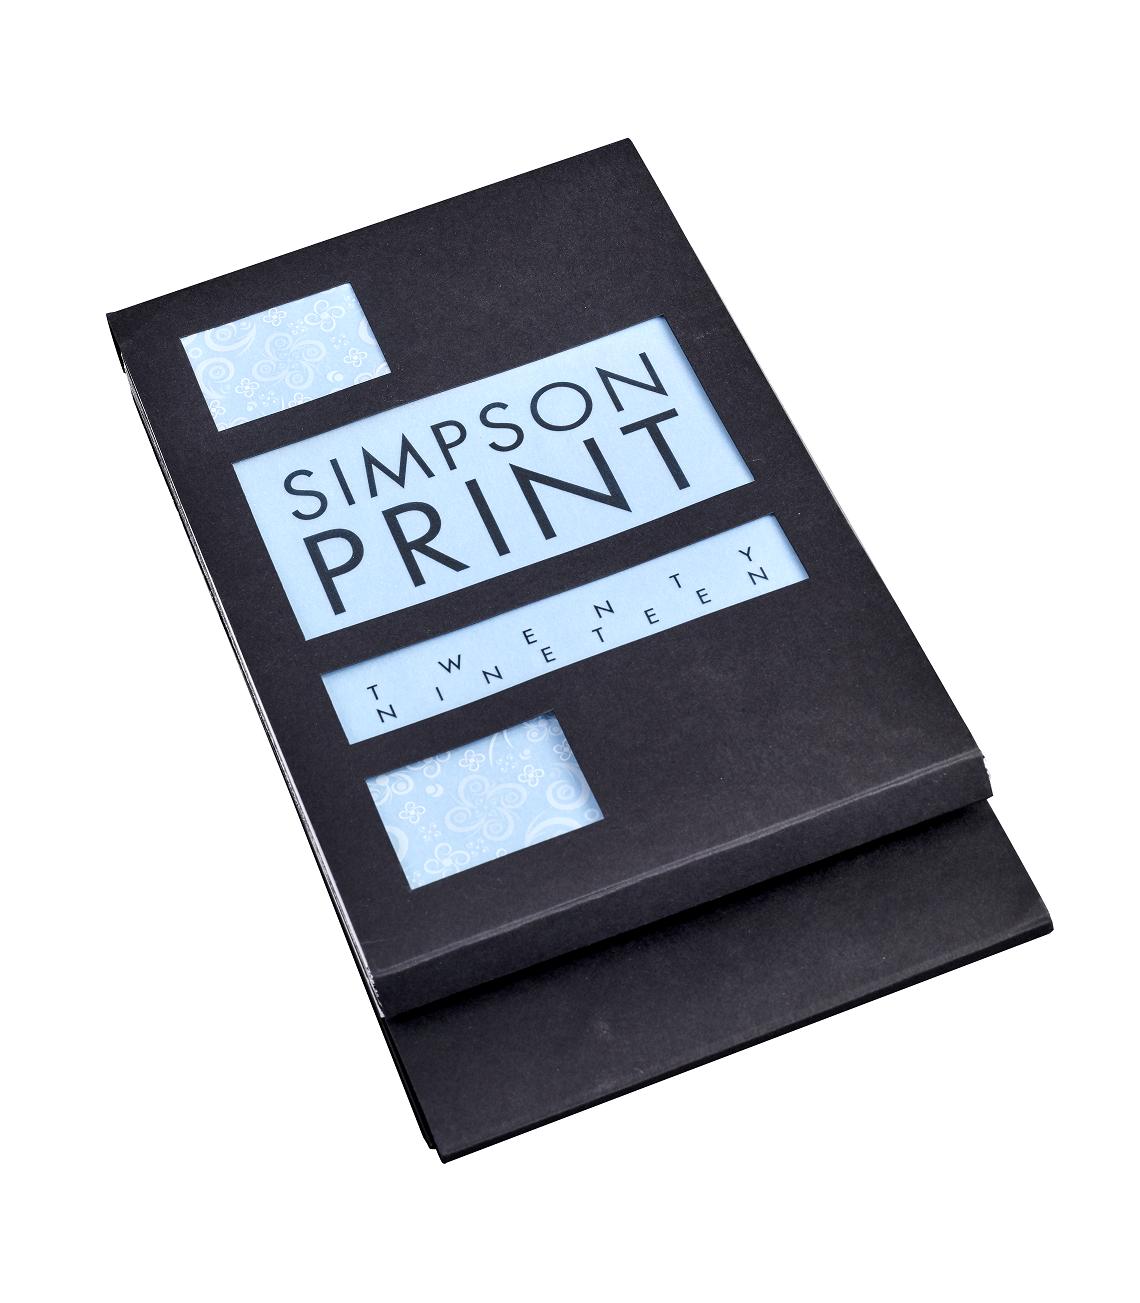 SIMPSON PRINT CALENDAR